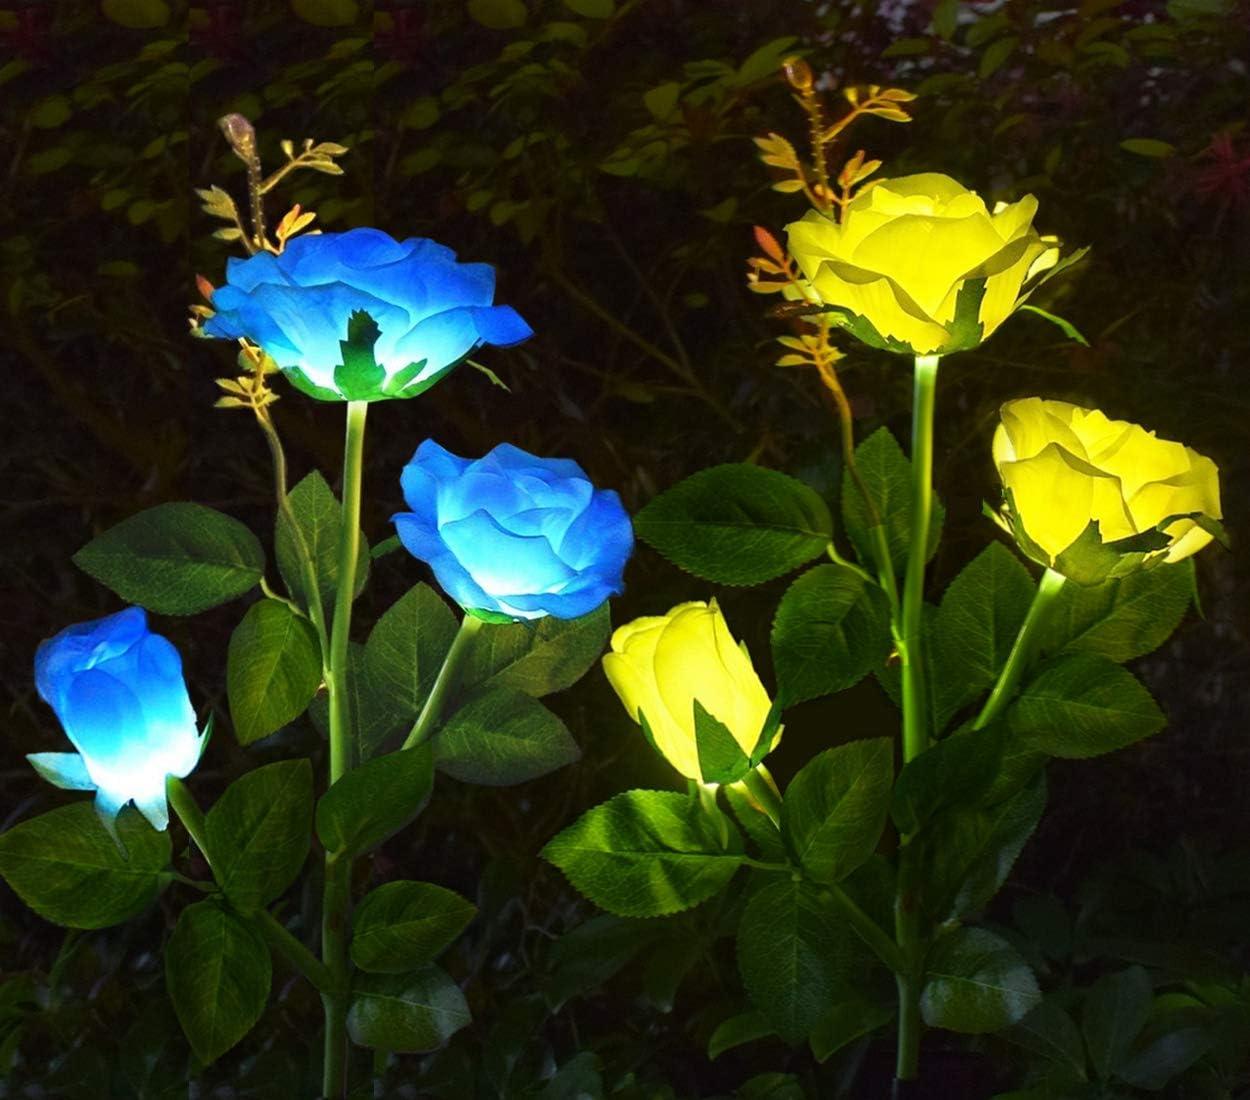 AB AttaBoy Solar Garden Rose Light, Solar Powered Garden Flower Lights, Waterproof LED Outdoor Solar Rose Stake Light for Garden, Courtyard,Backyard Decoration 2 Pack, Blue Yellow